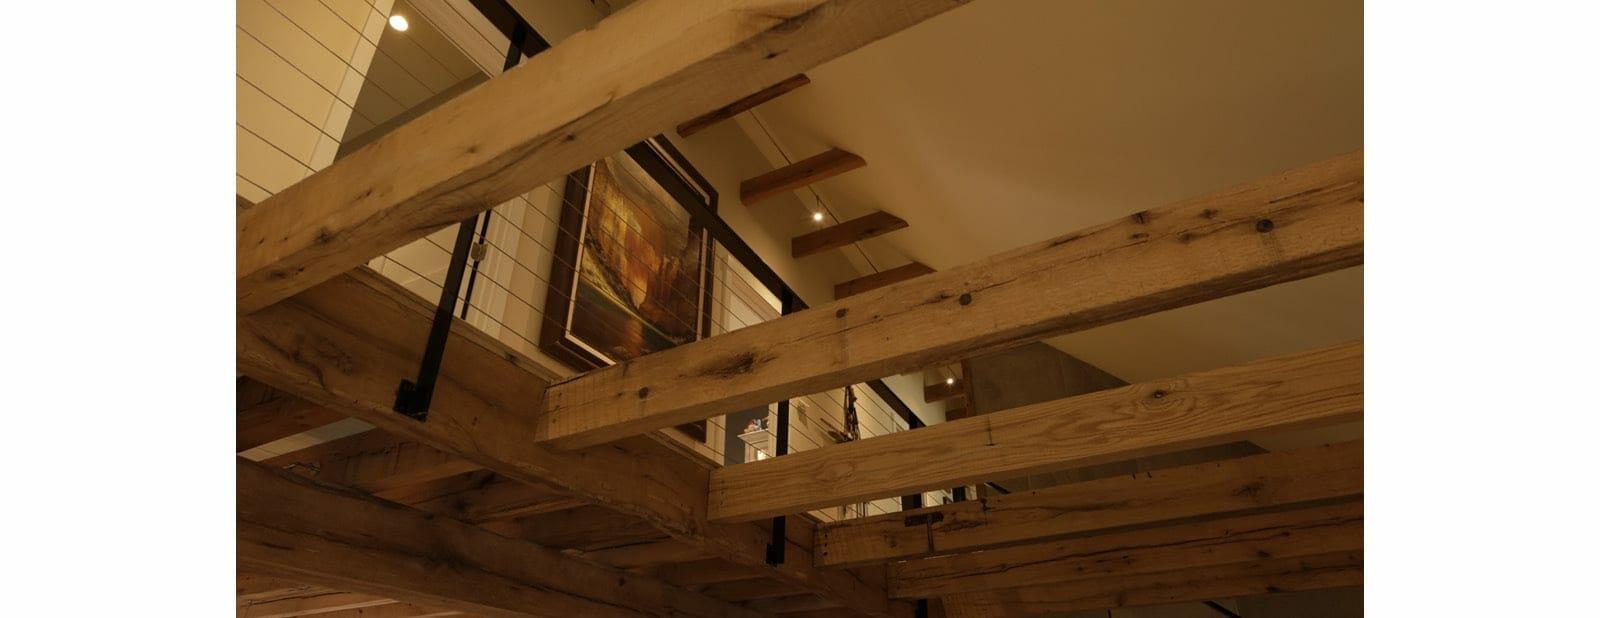 berwyn residence beams